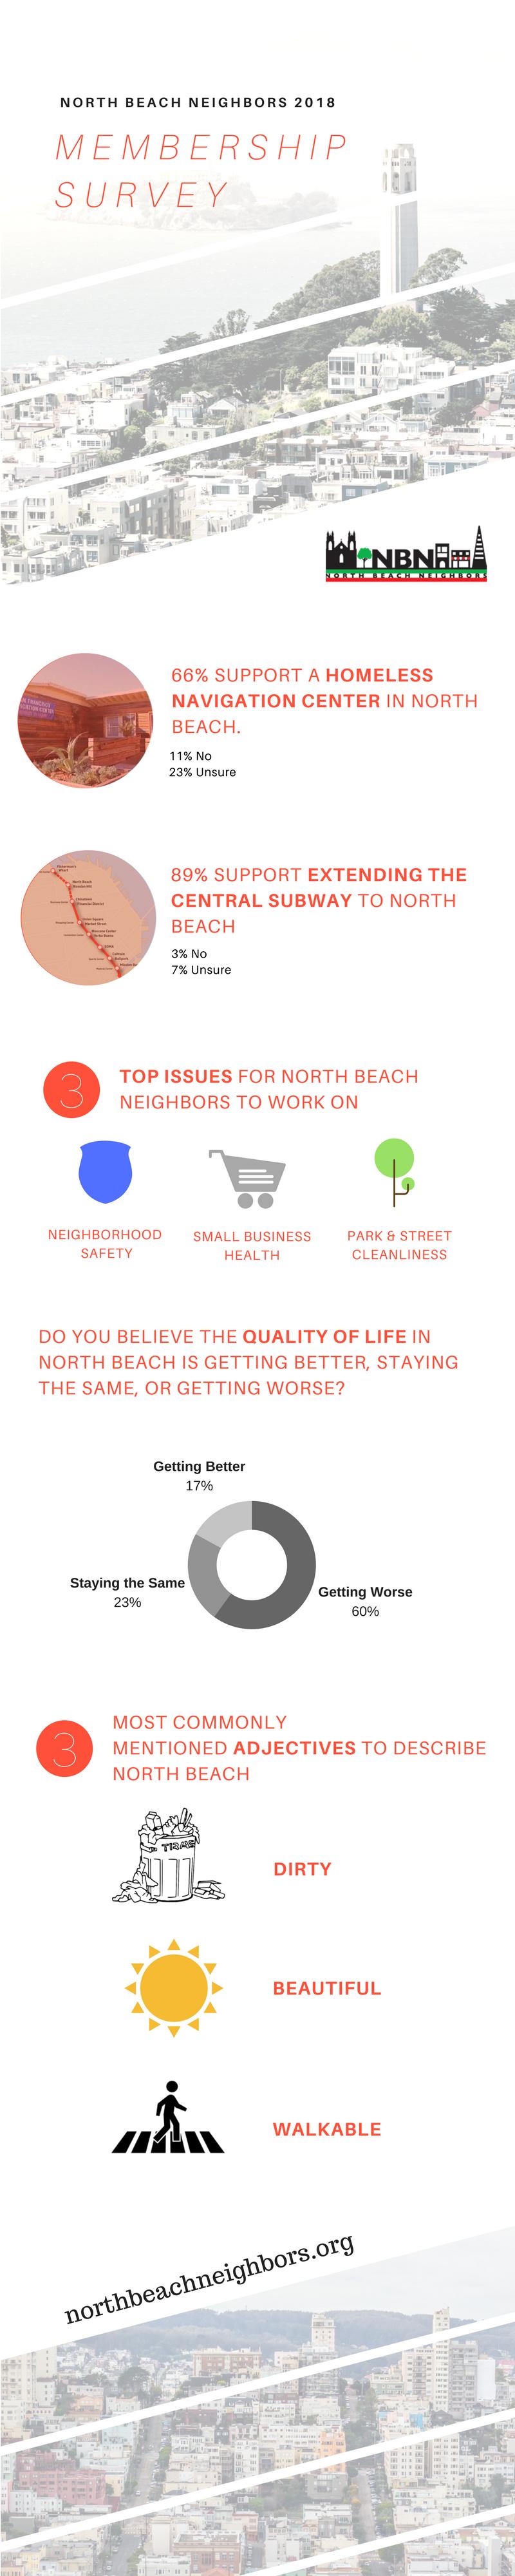 NorthBeachNeighbors-2018Survey-Graphic.png